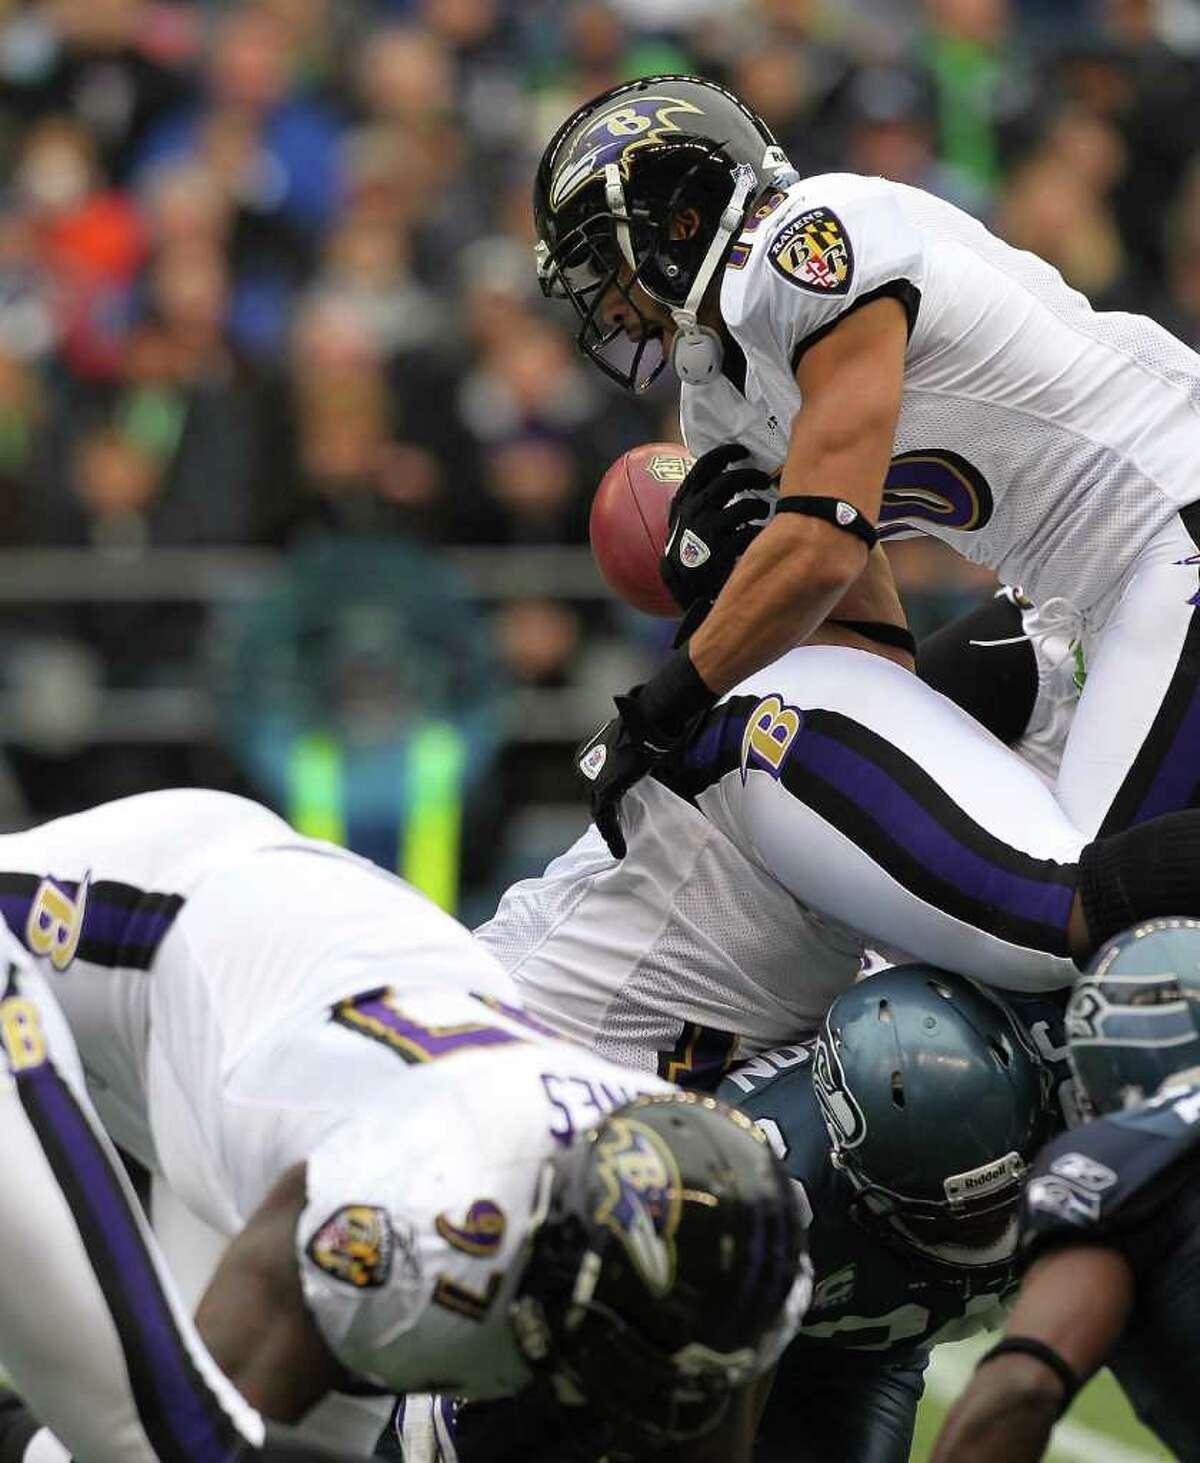 SEATTLE - NOVEMBER 13: Kick returner David Reed #16 of the Baltimore Ravens fumbles against the Seattle Seahawks at CenturyLink Field on November 13, 2011 in Seattle, Washington.